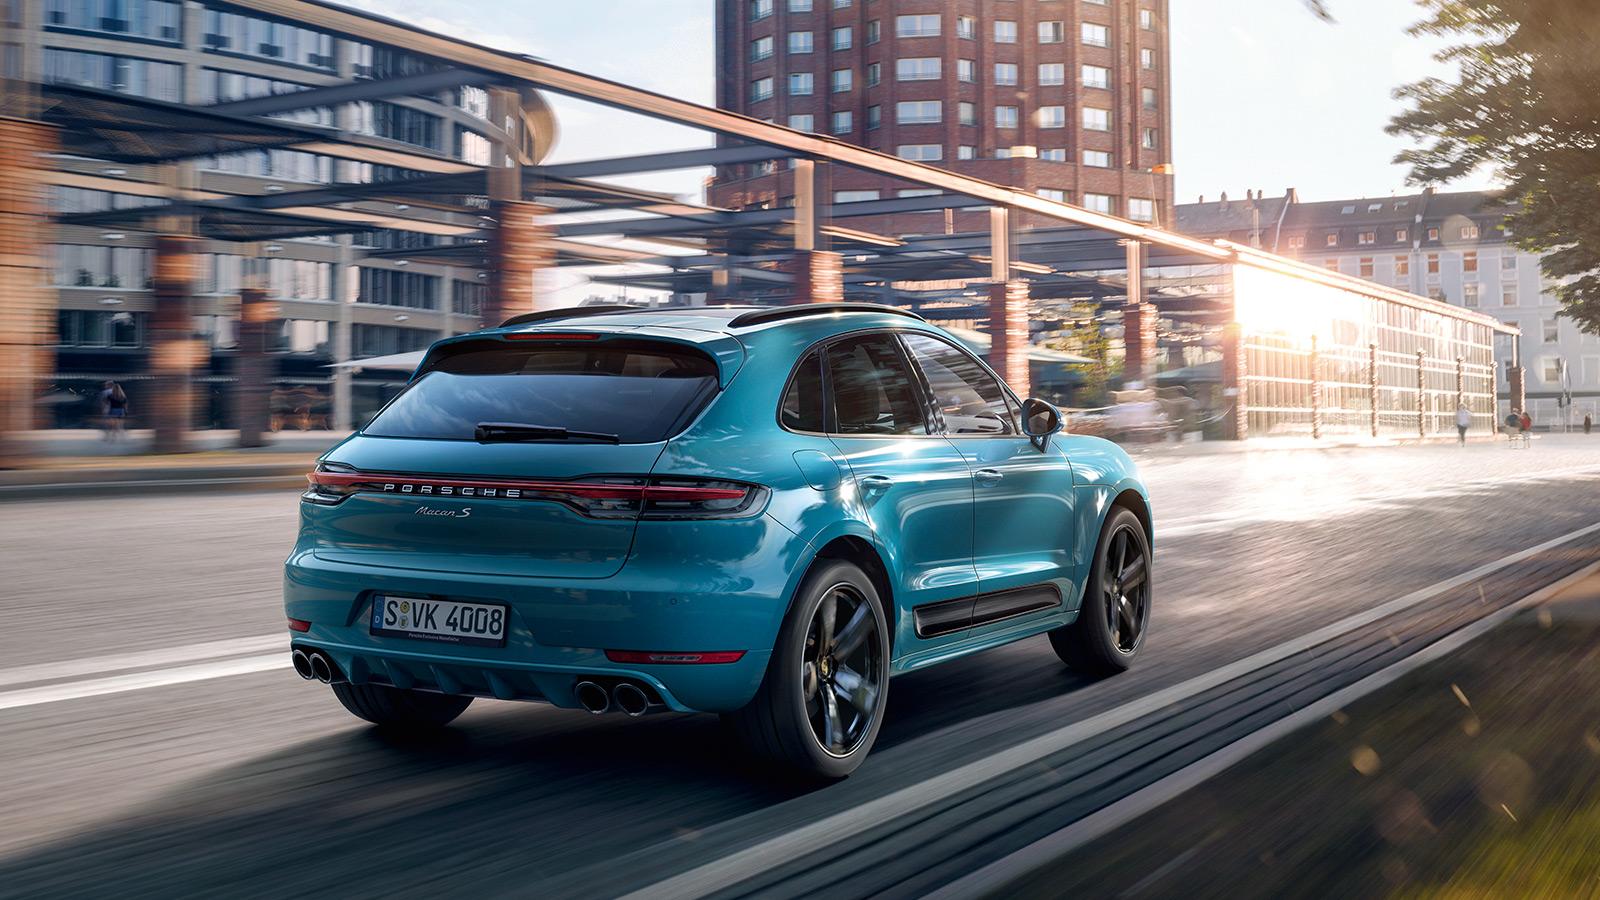 Porsche - Exterior e desempenho